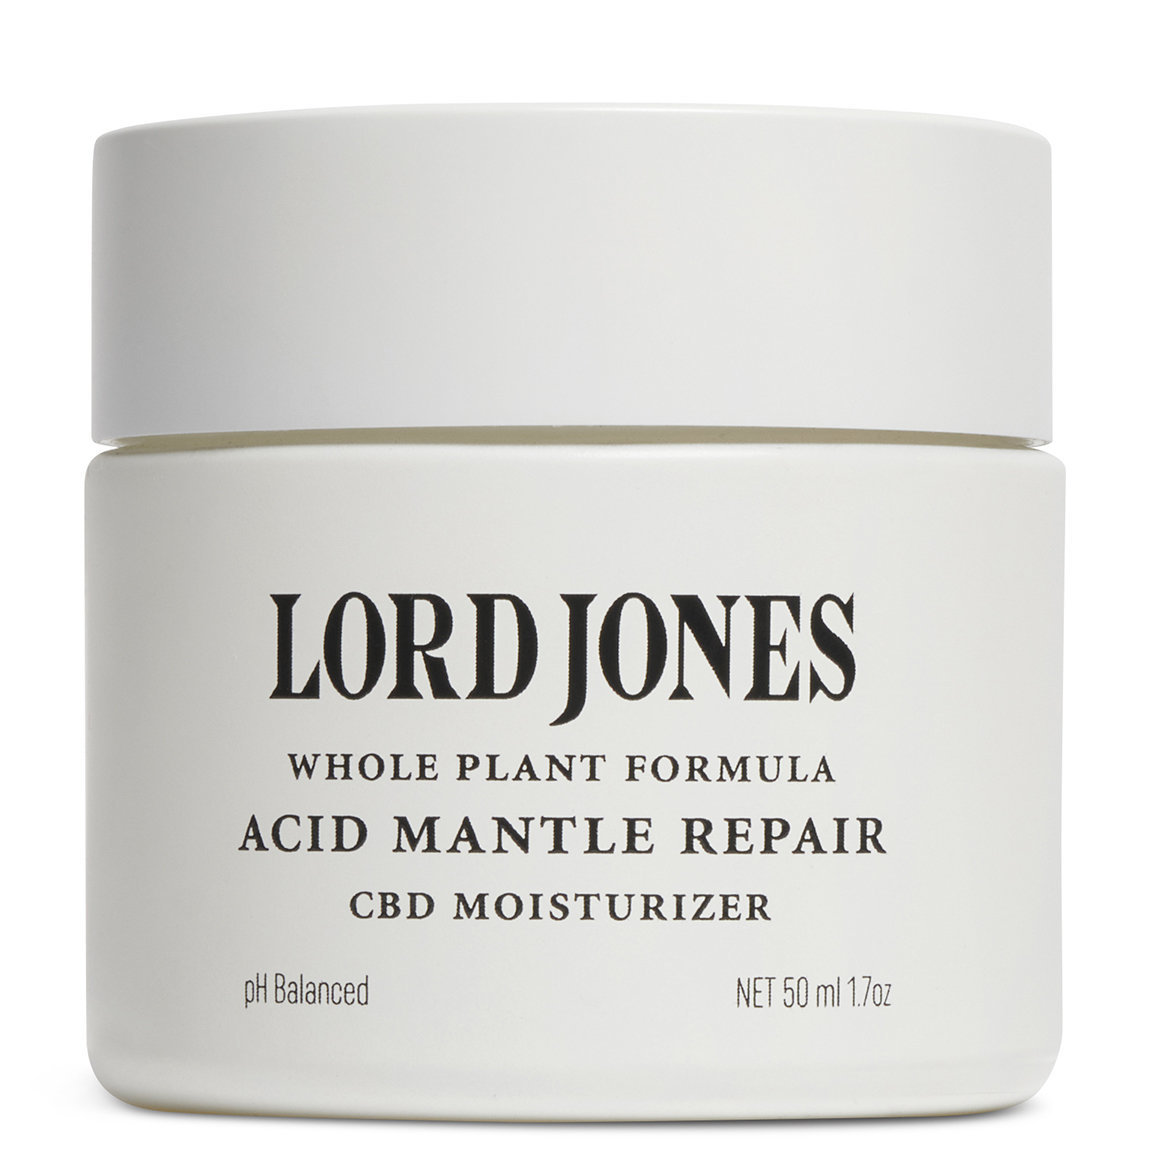 Lord Jones Acid Mantle Repair Facial Moisturizer product swatch.